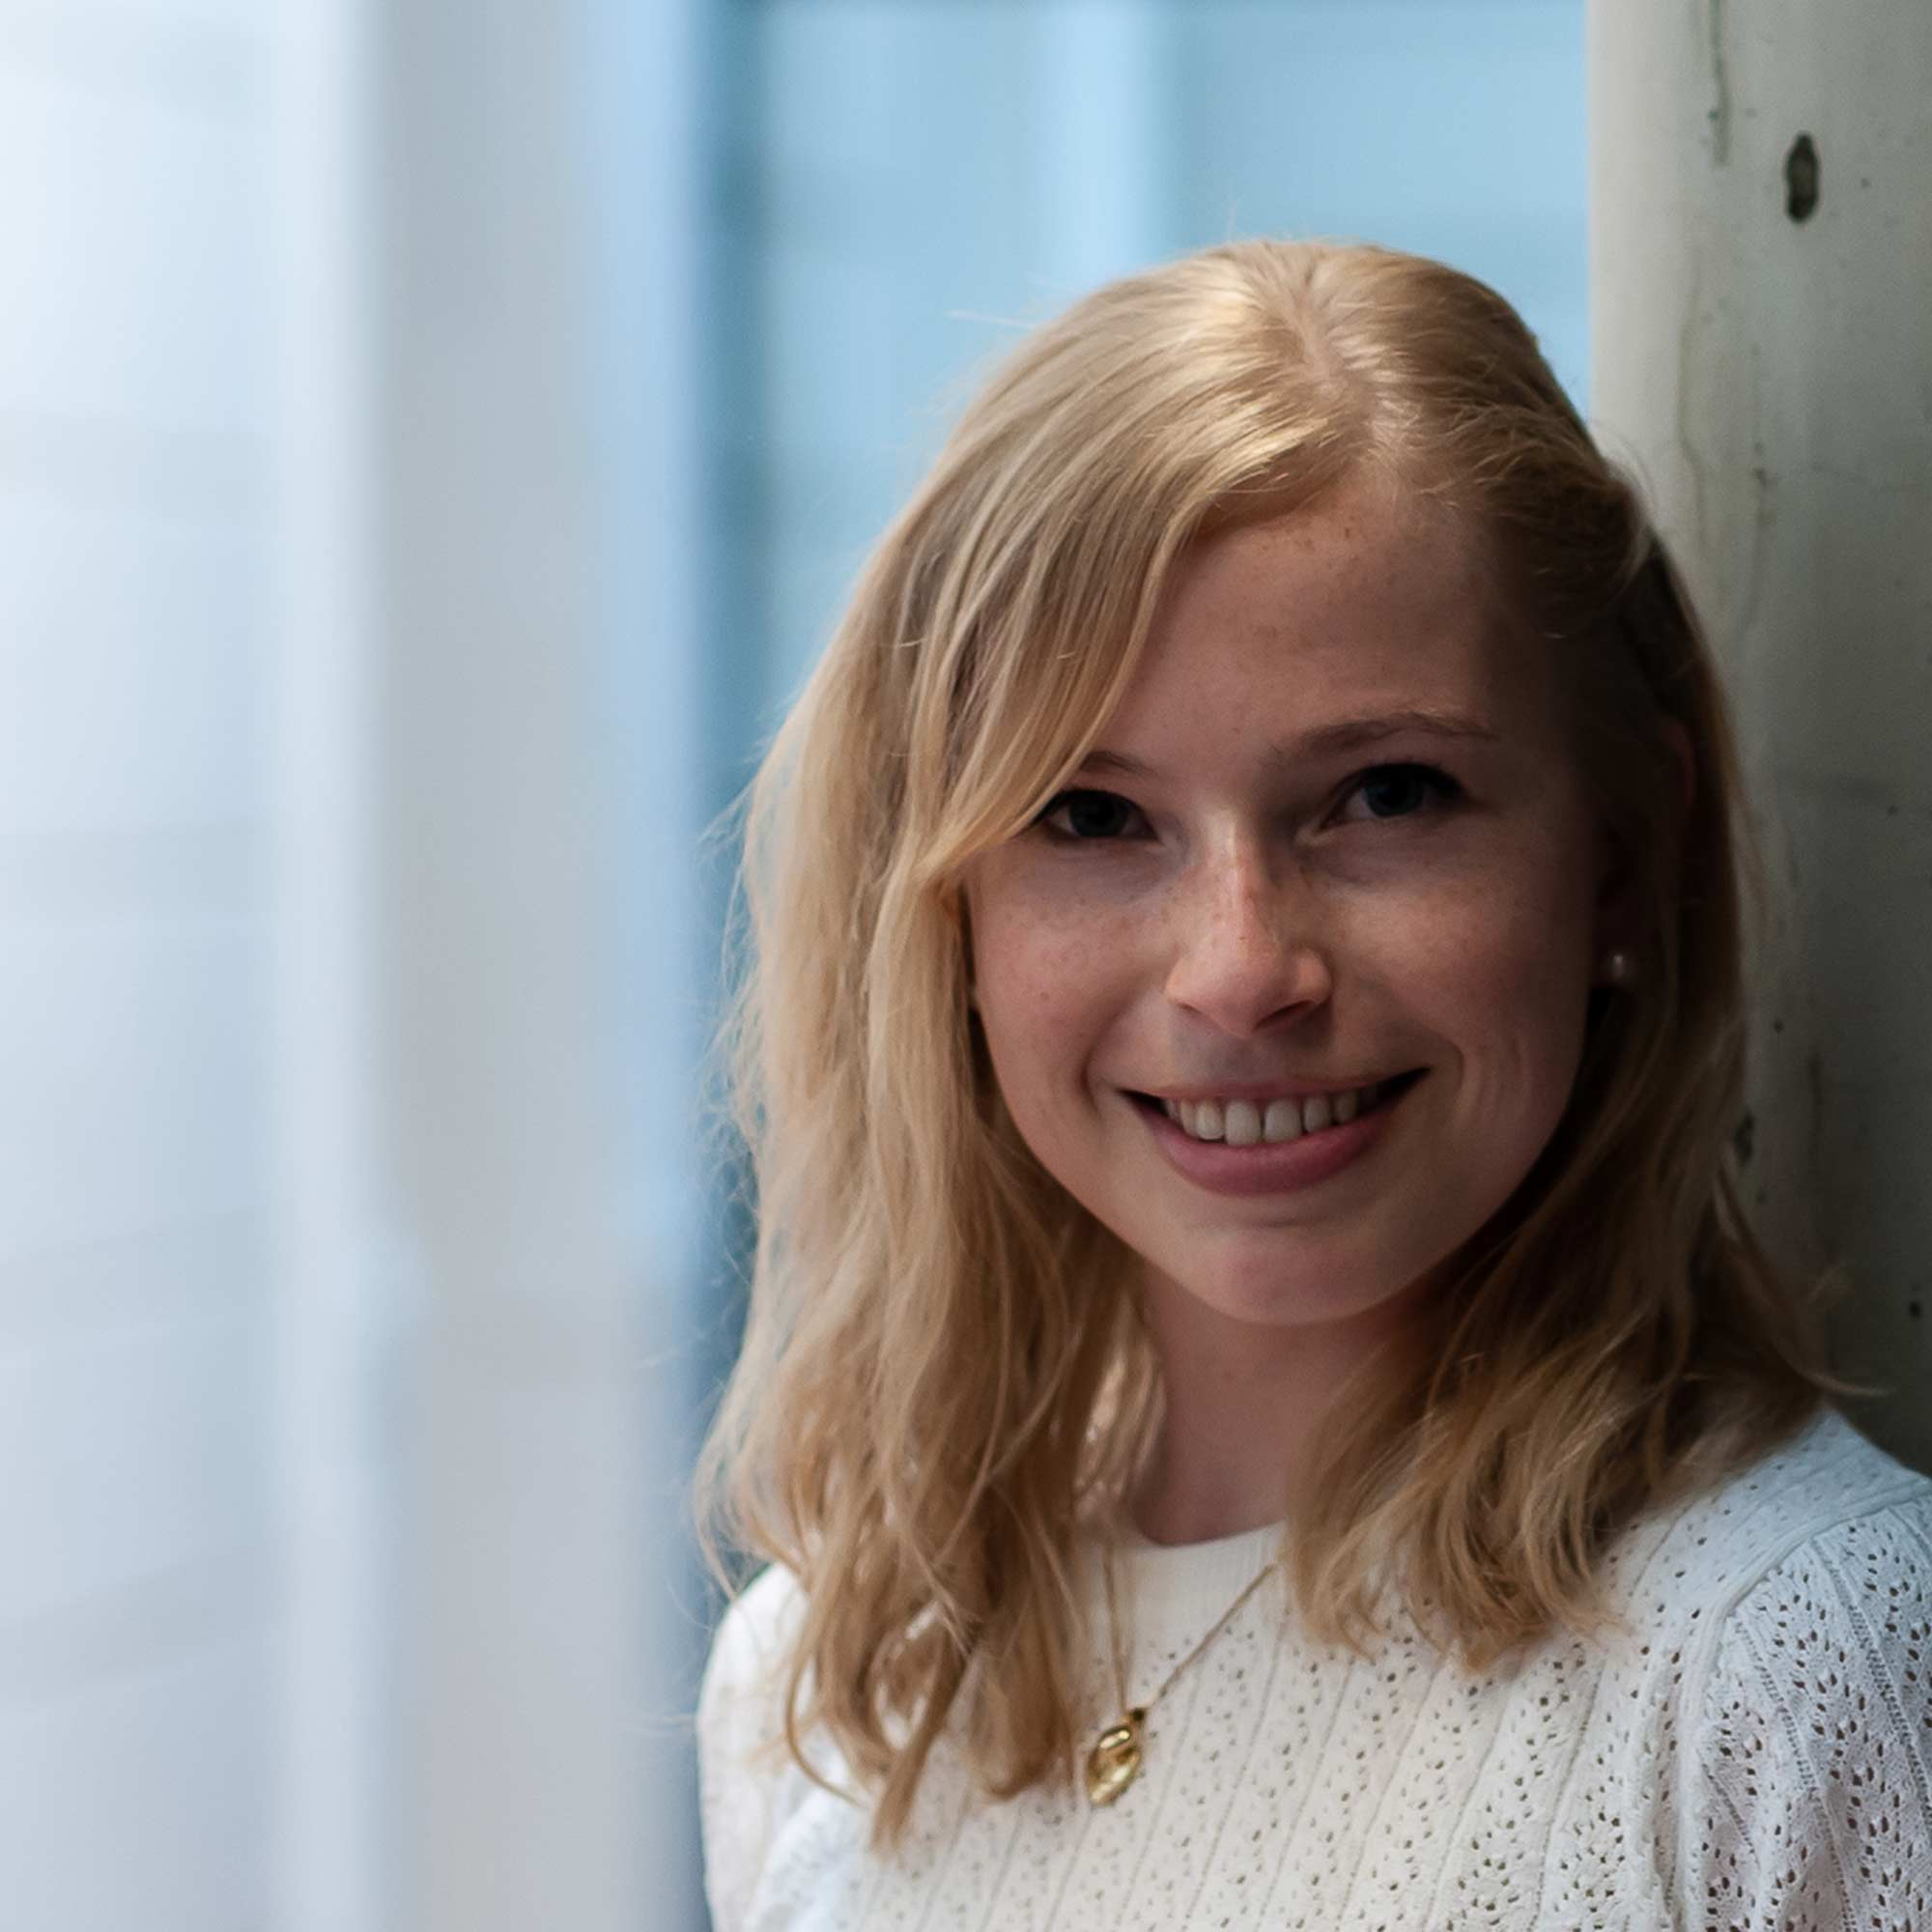 Verena Hohenwarter